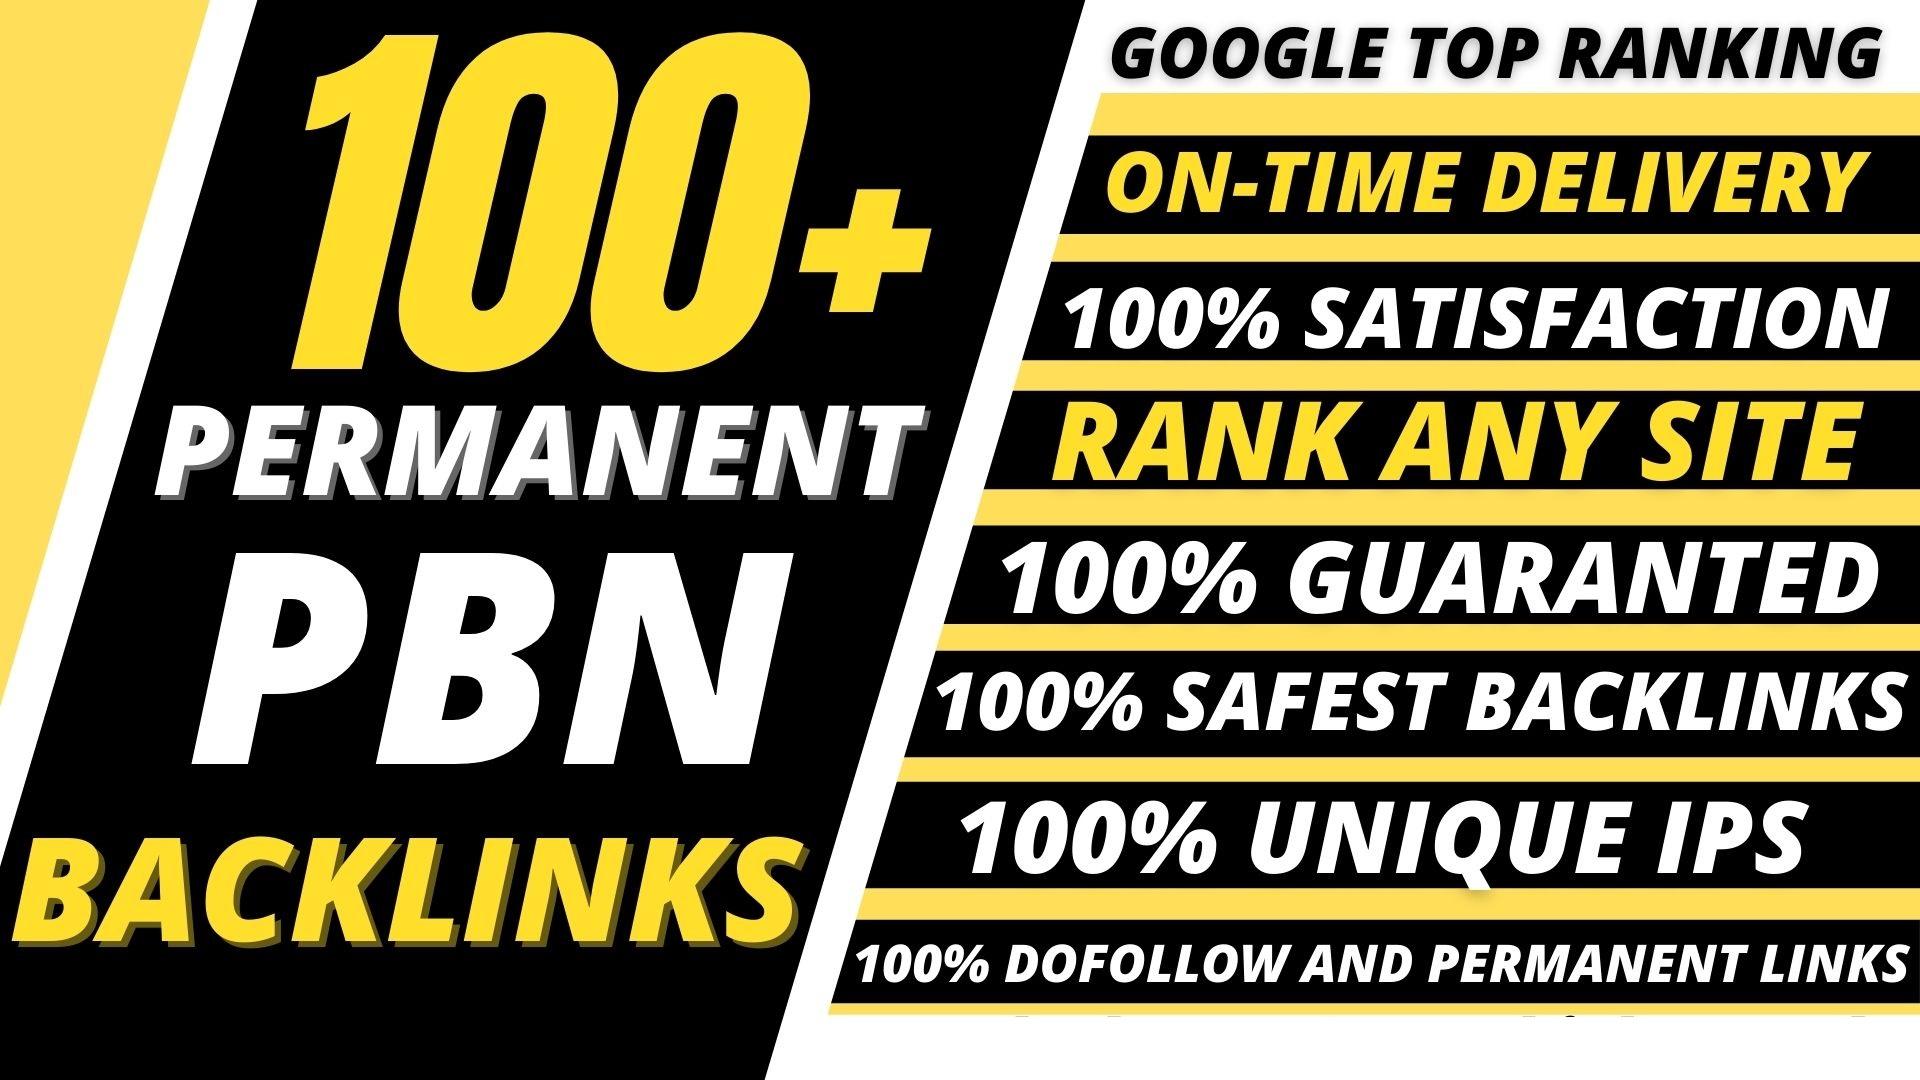 Get 100 Web 2.0 PBN Dofollow Backlinks improve your website ranking